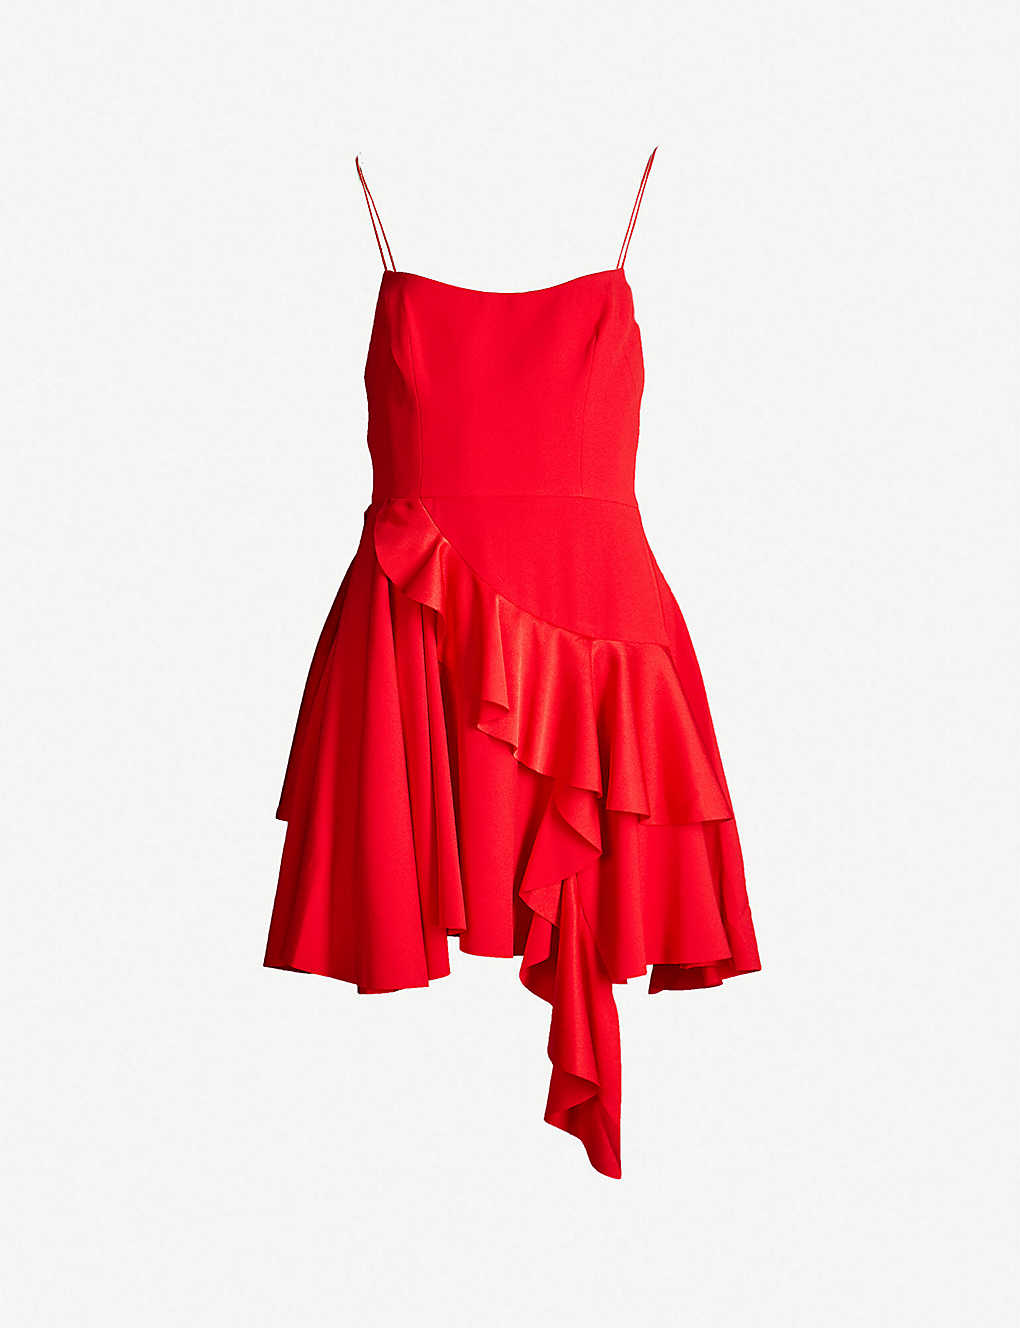 ALEX PERRY - Corin ruffled crepe mini dress   Selfridges com